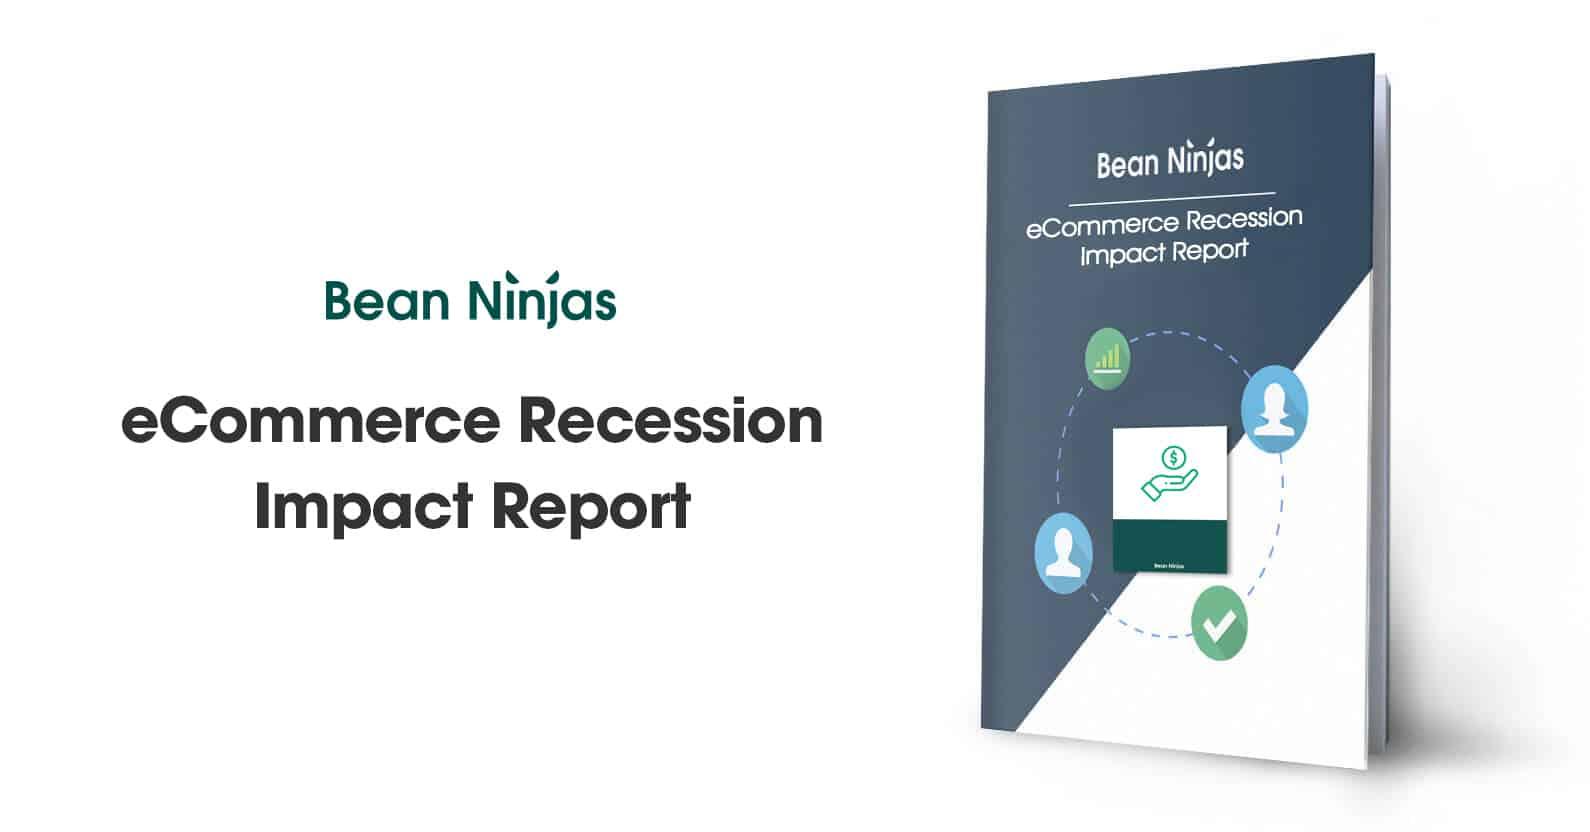 Bean Ninjas' Inaugural eCommerce Recession Impact Report 2020